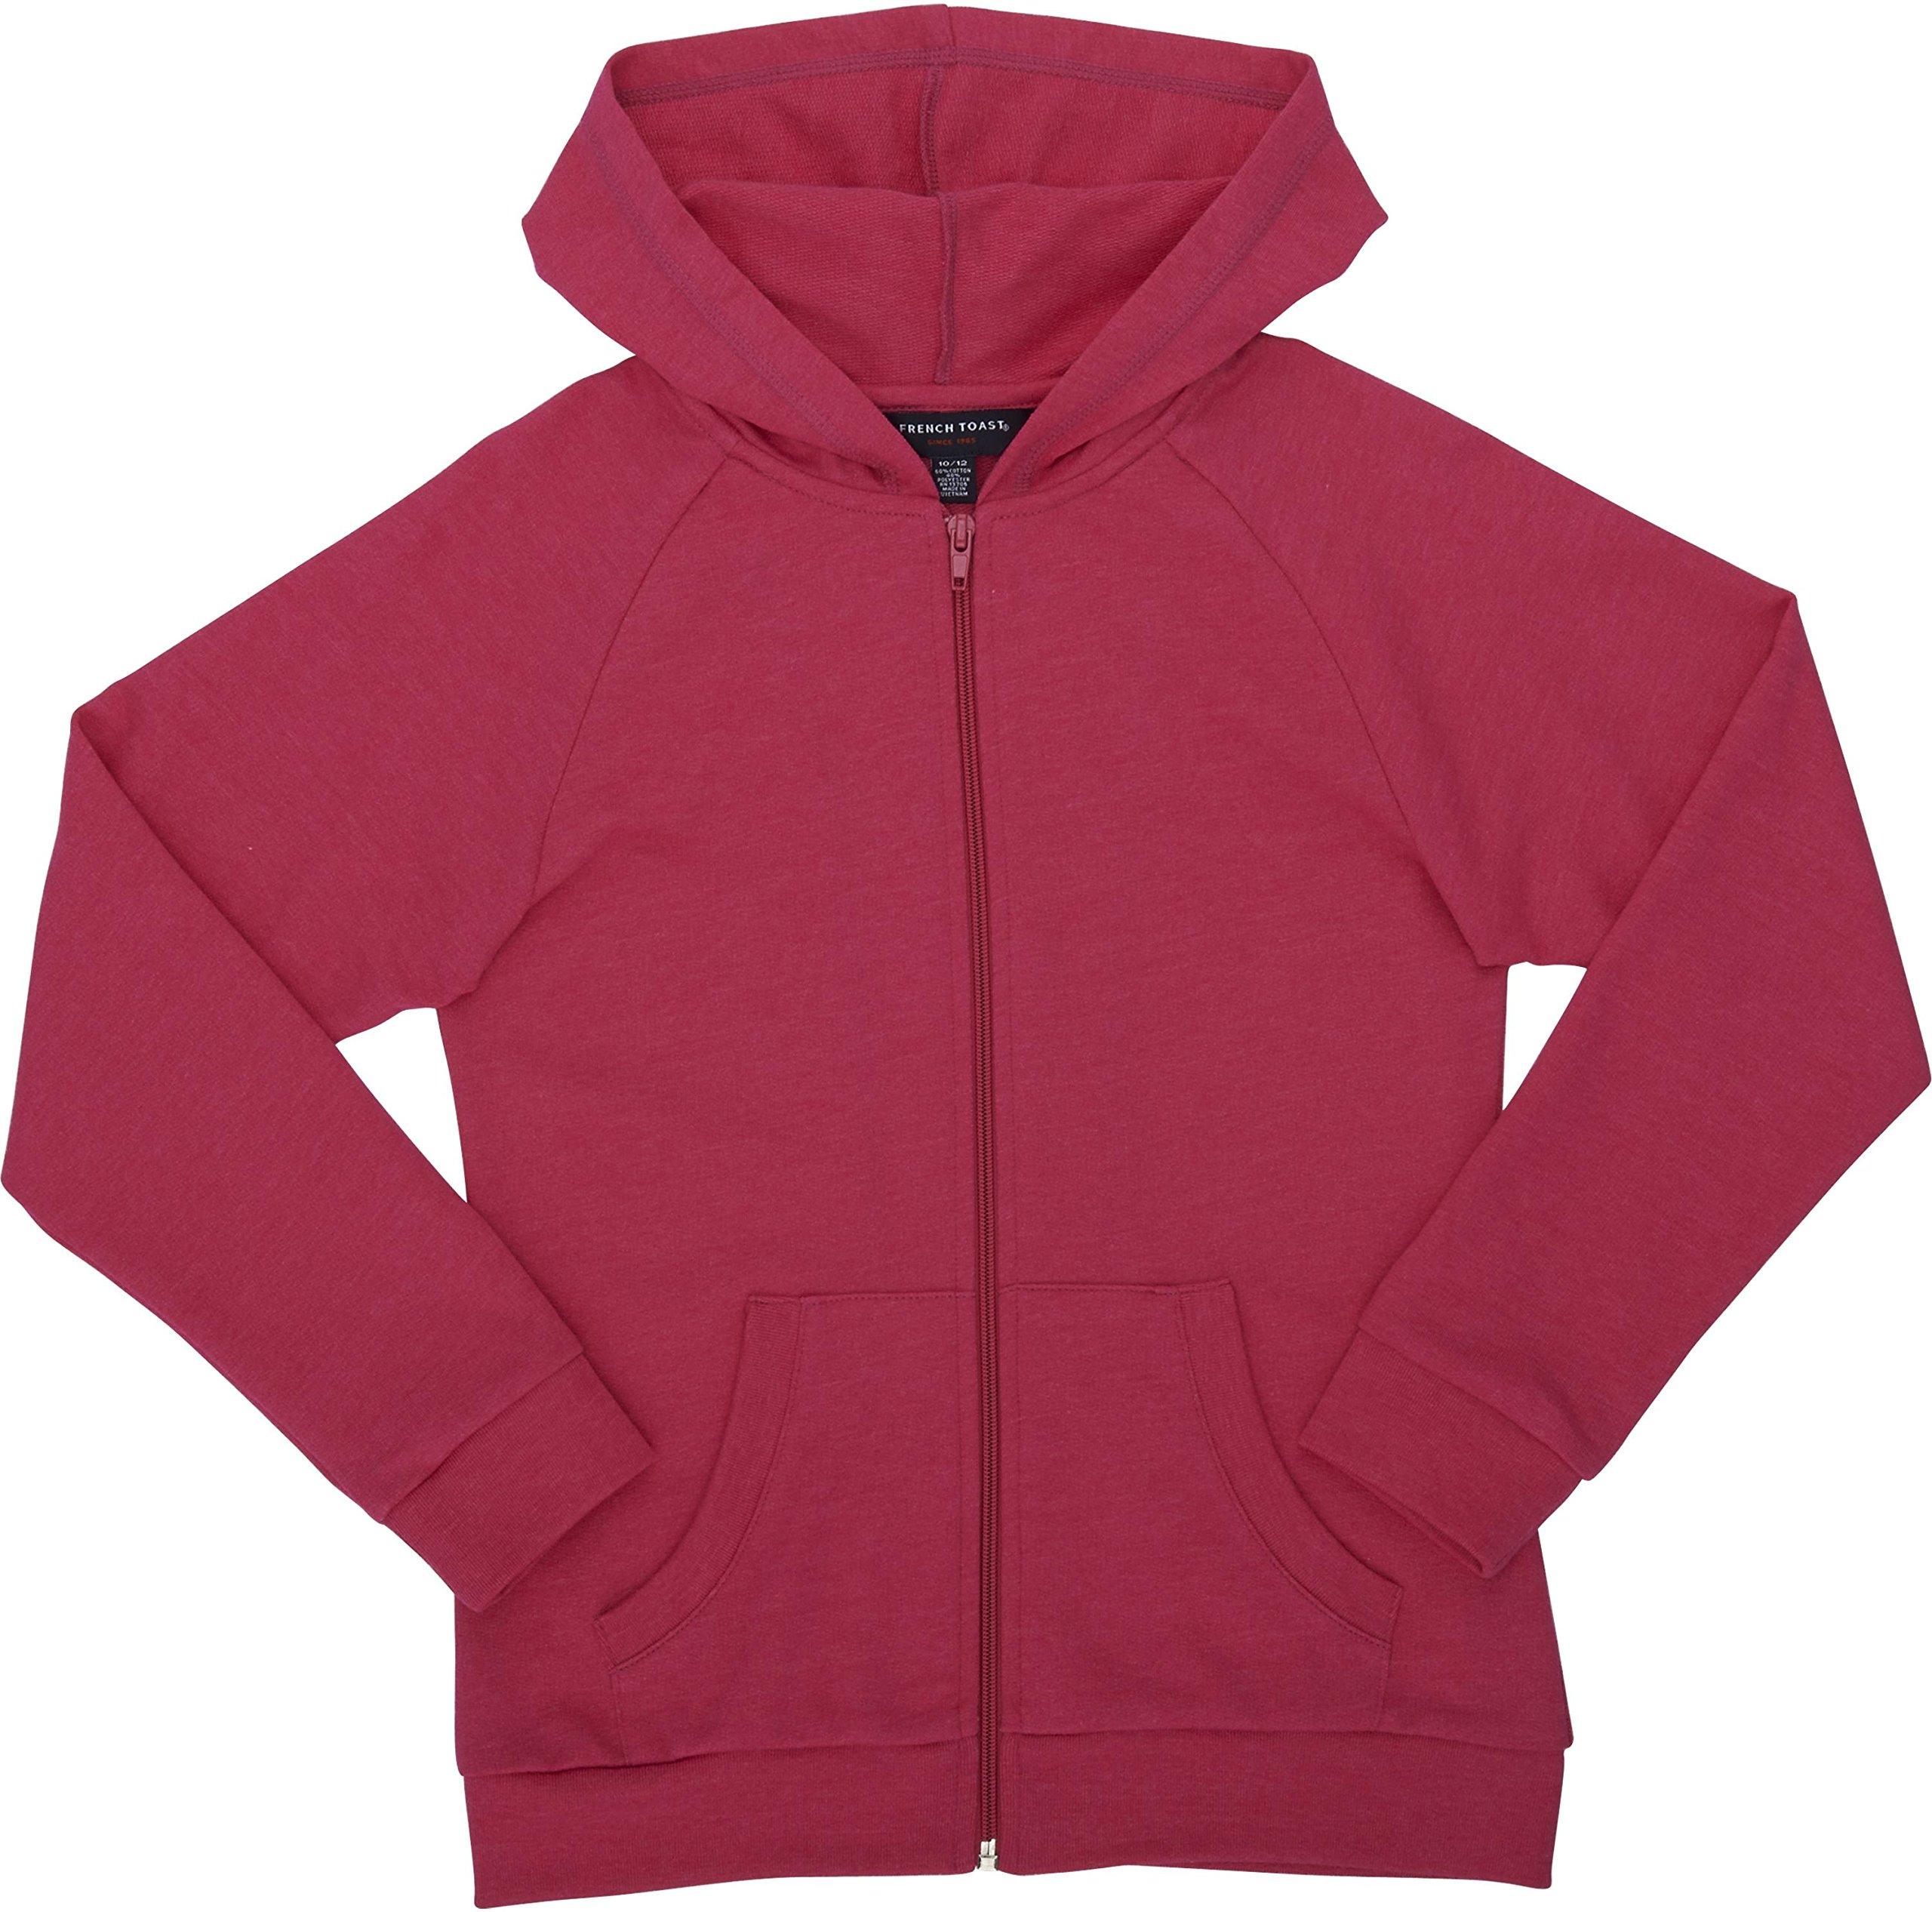 French Toast School Uniform Girls Active Jacket Hoodie, Shocking Fuchsia Heather, Large (10/12)